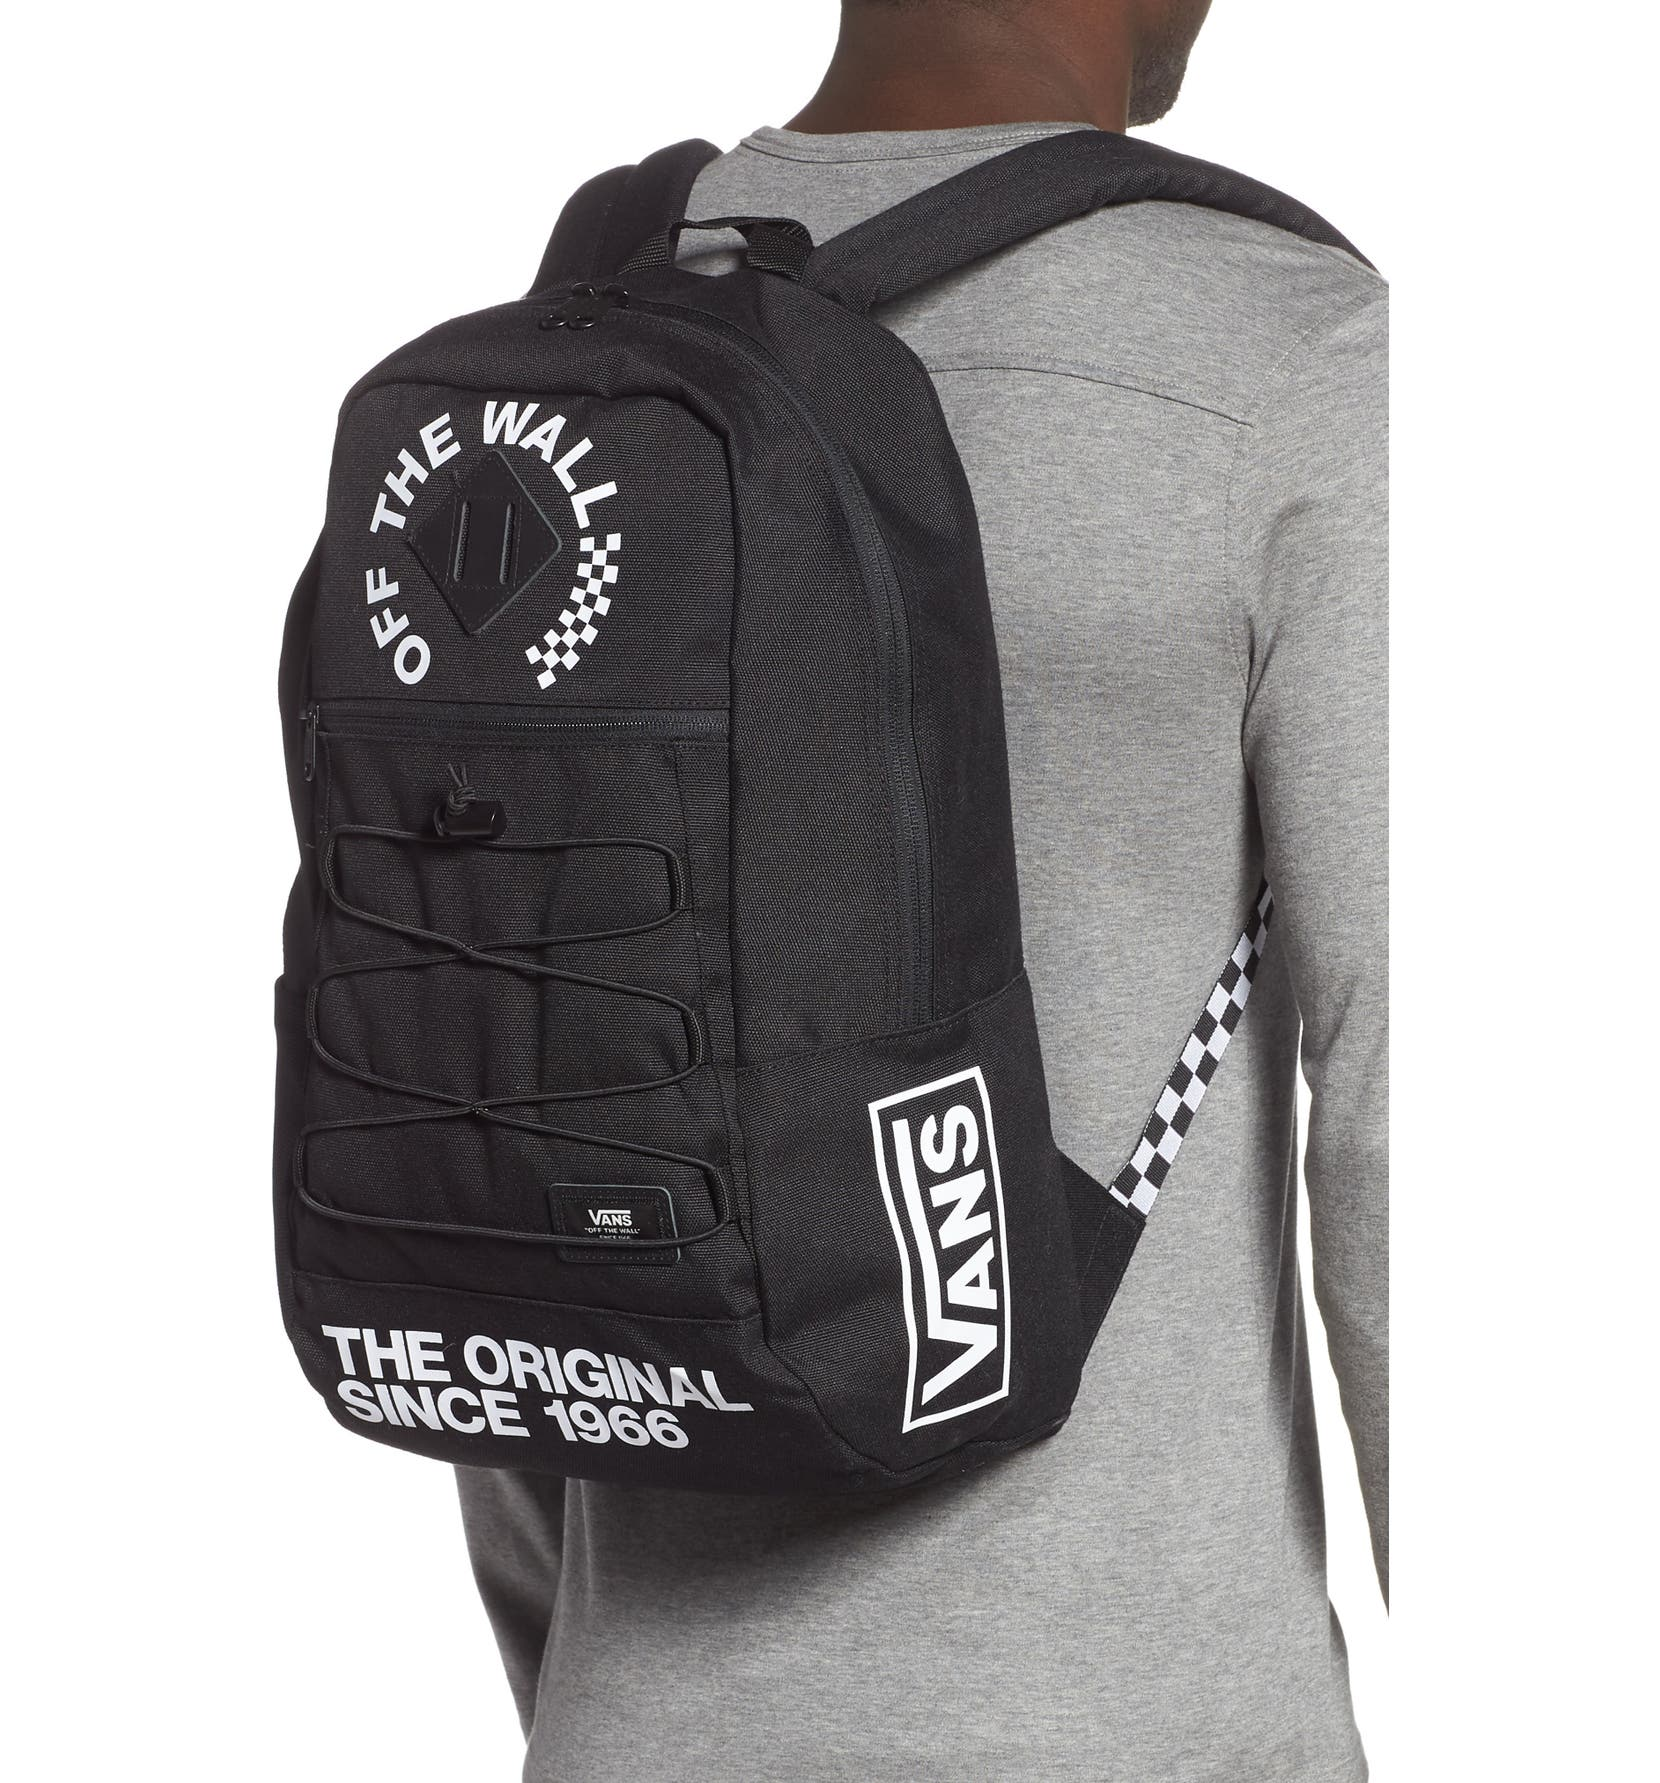 8d2ad5b3418 Vans Snag Water Resistant Backpack